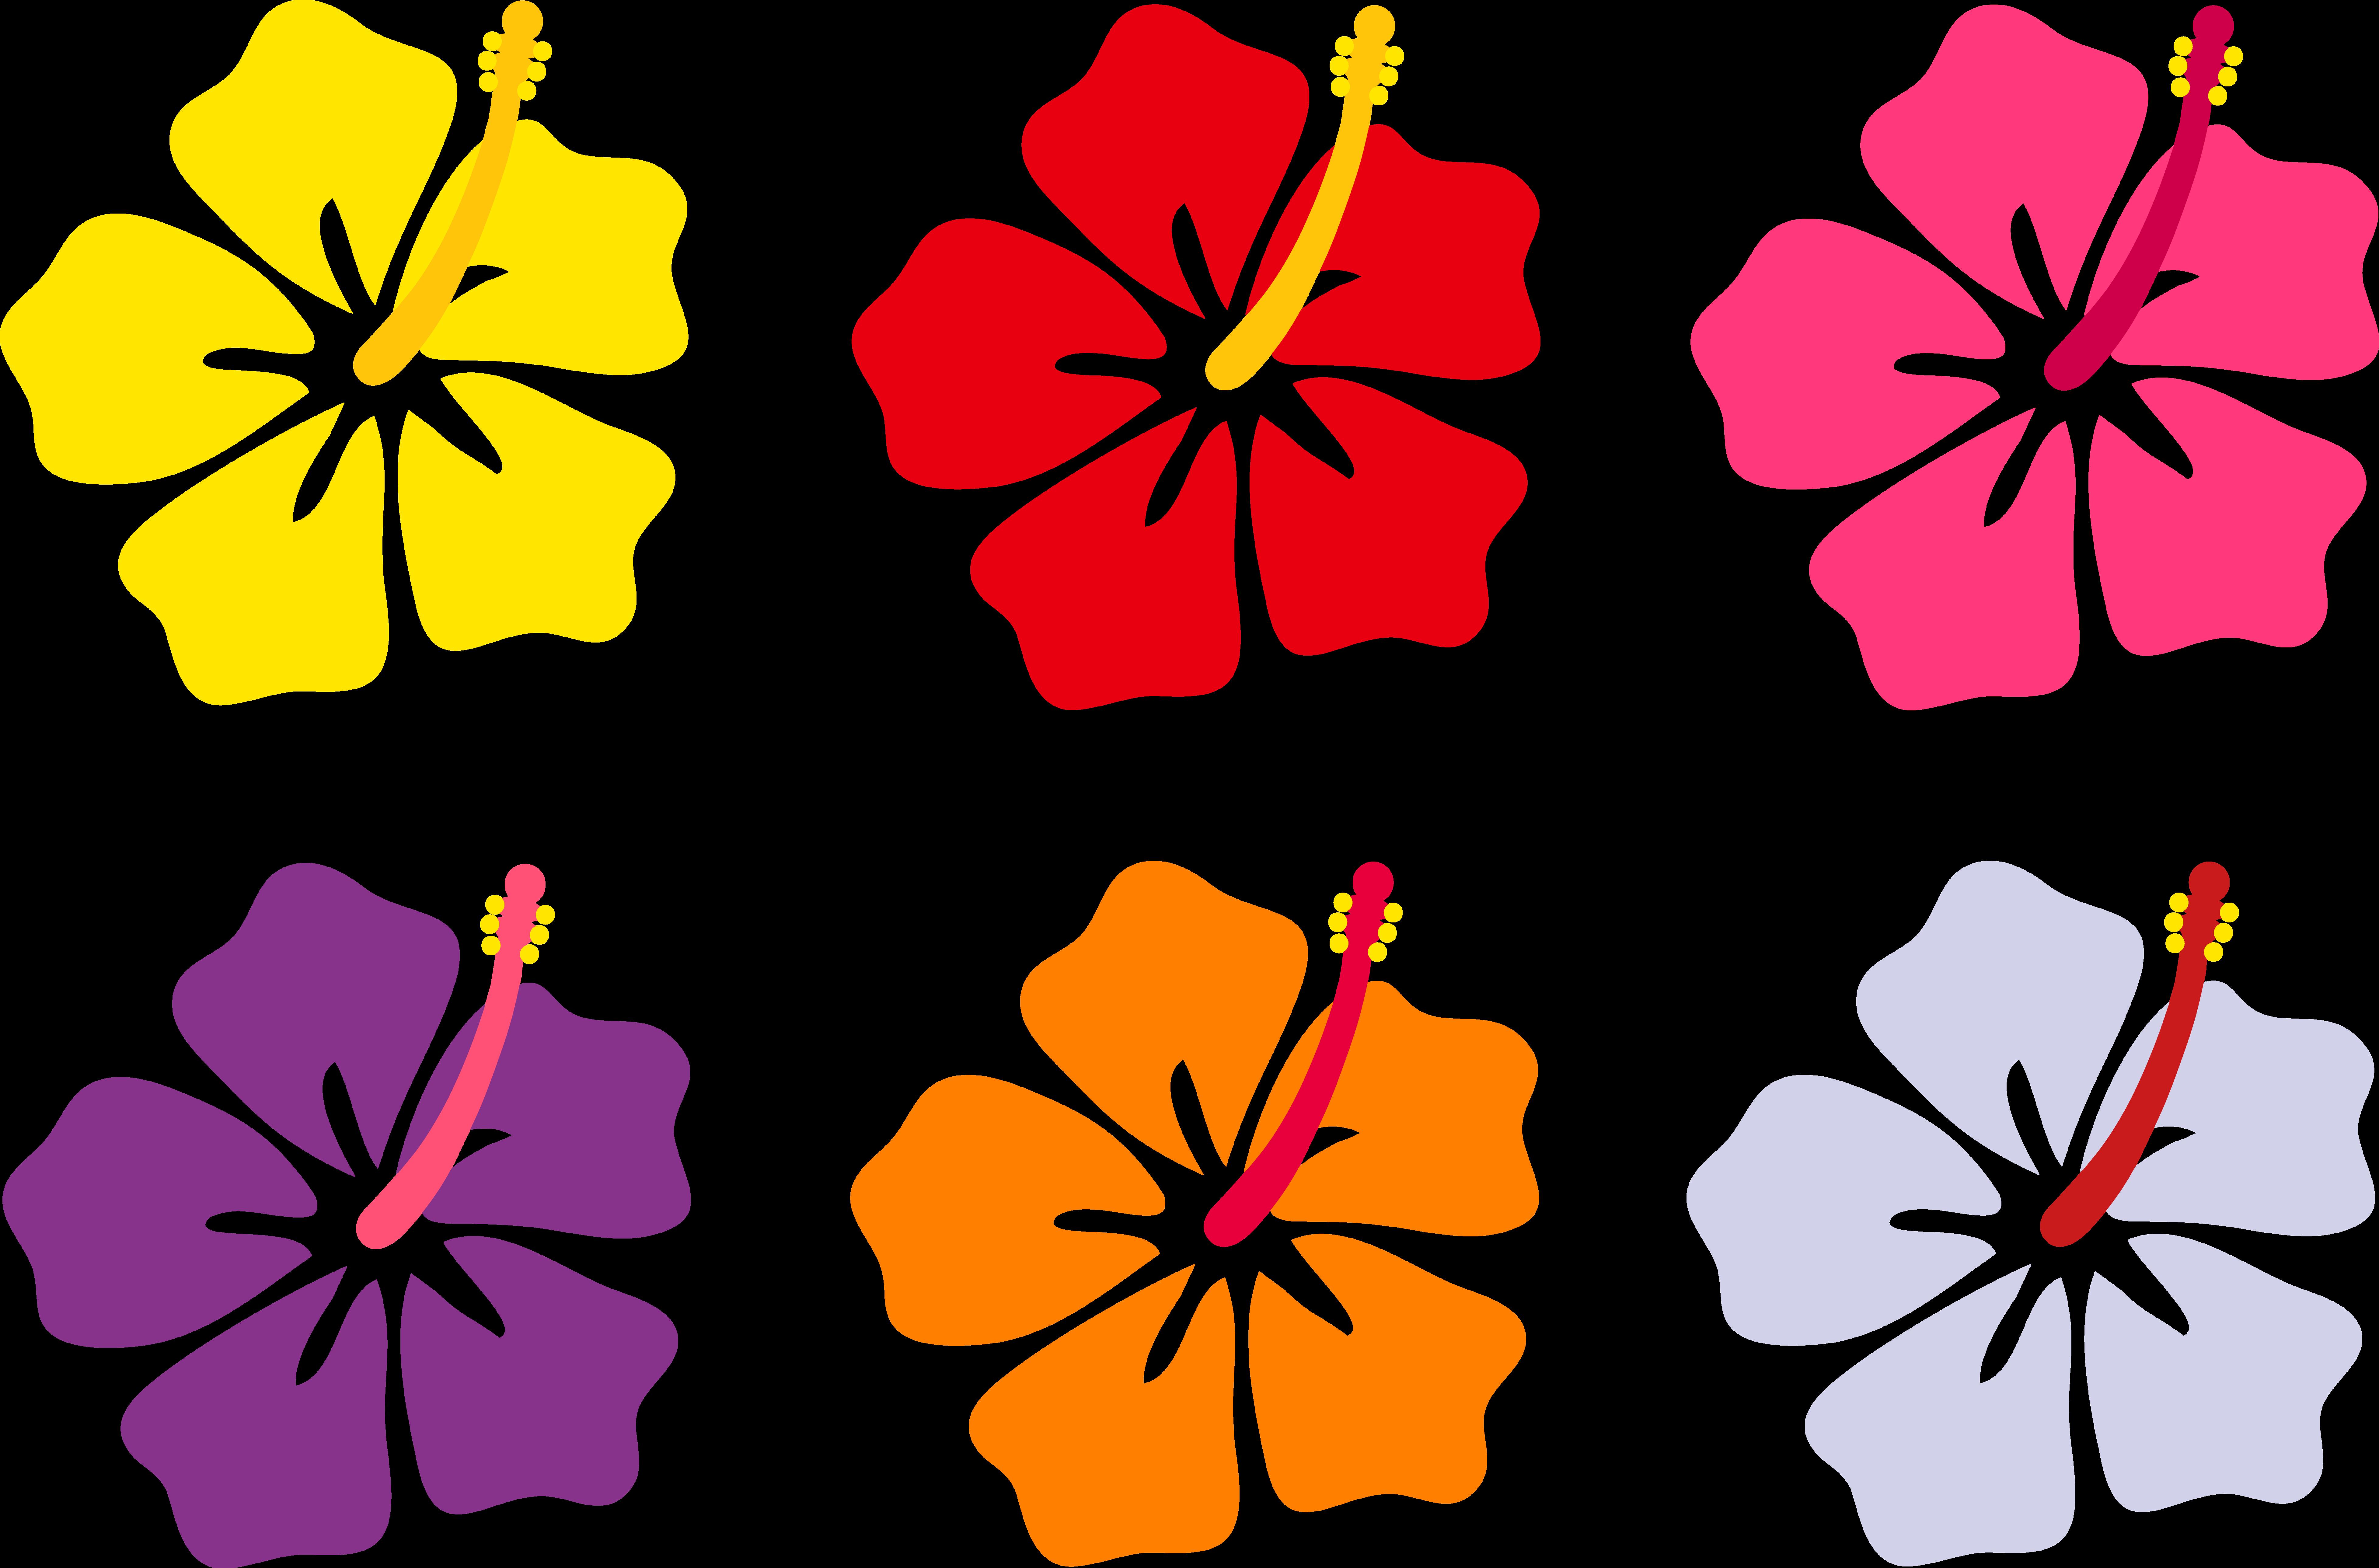 Yellow hawaiian flower images. Plants clipart gumamela